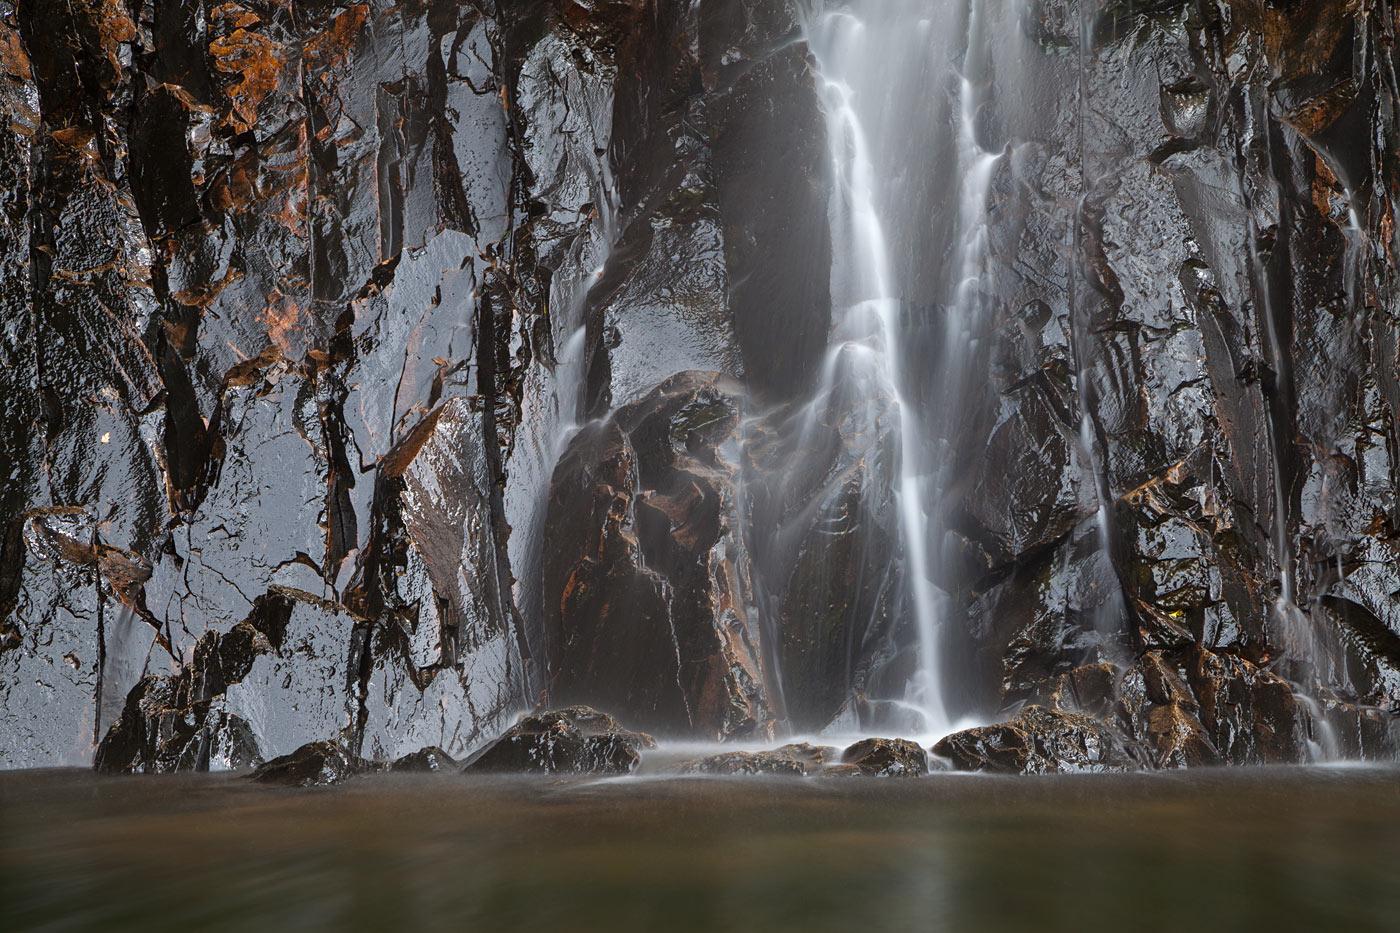 Big-Bend-National-Park-ABP-Cattail-Falls-detail.jpg